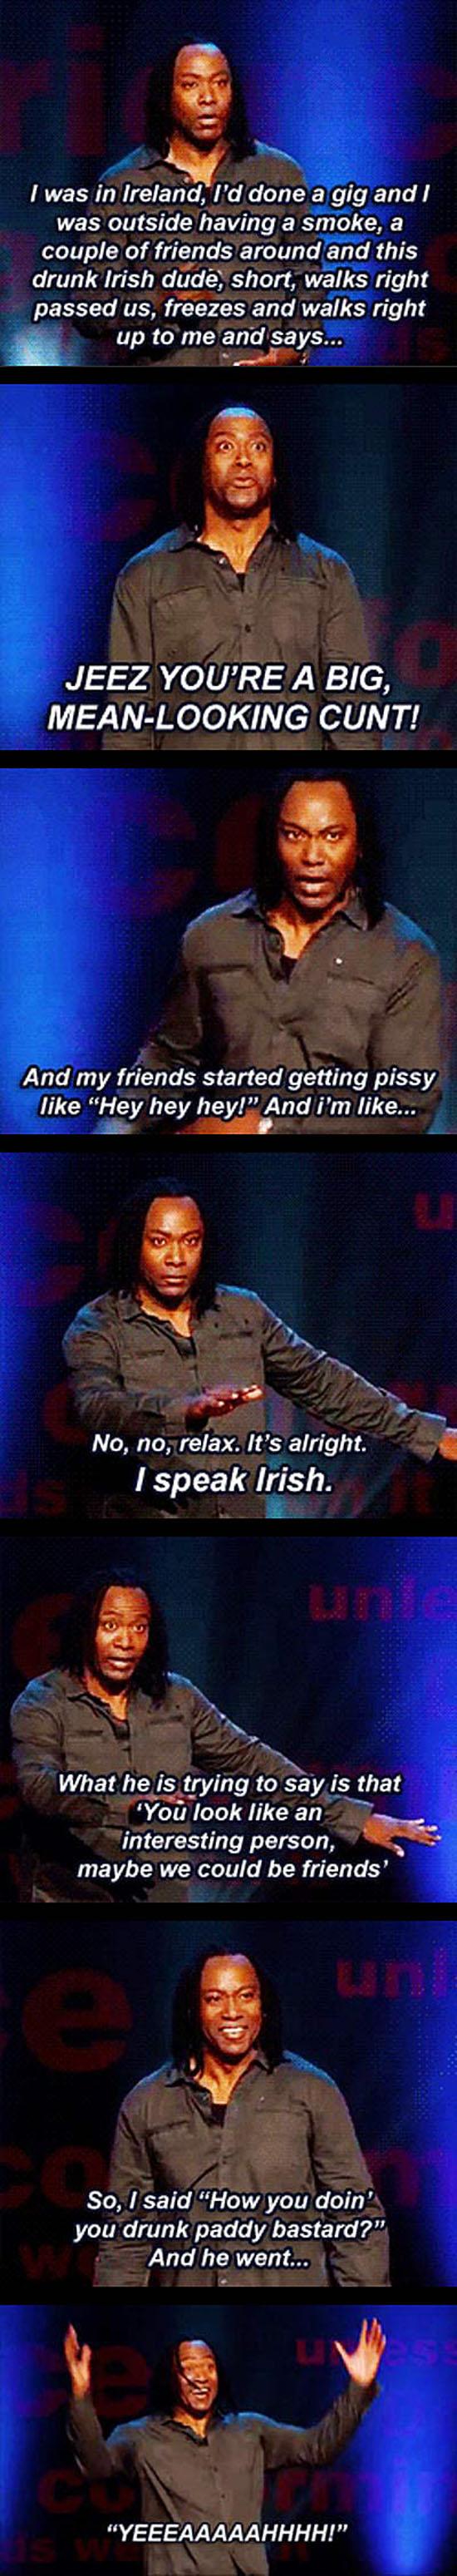 Drunk Irishman